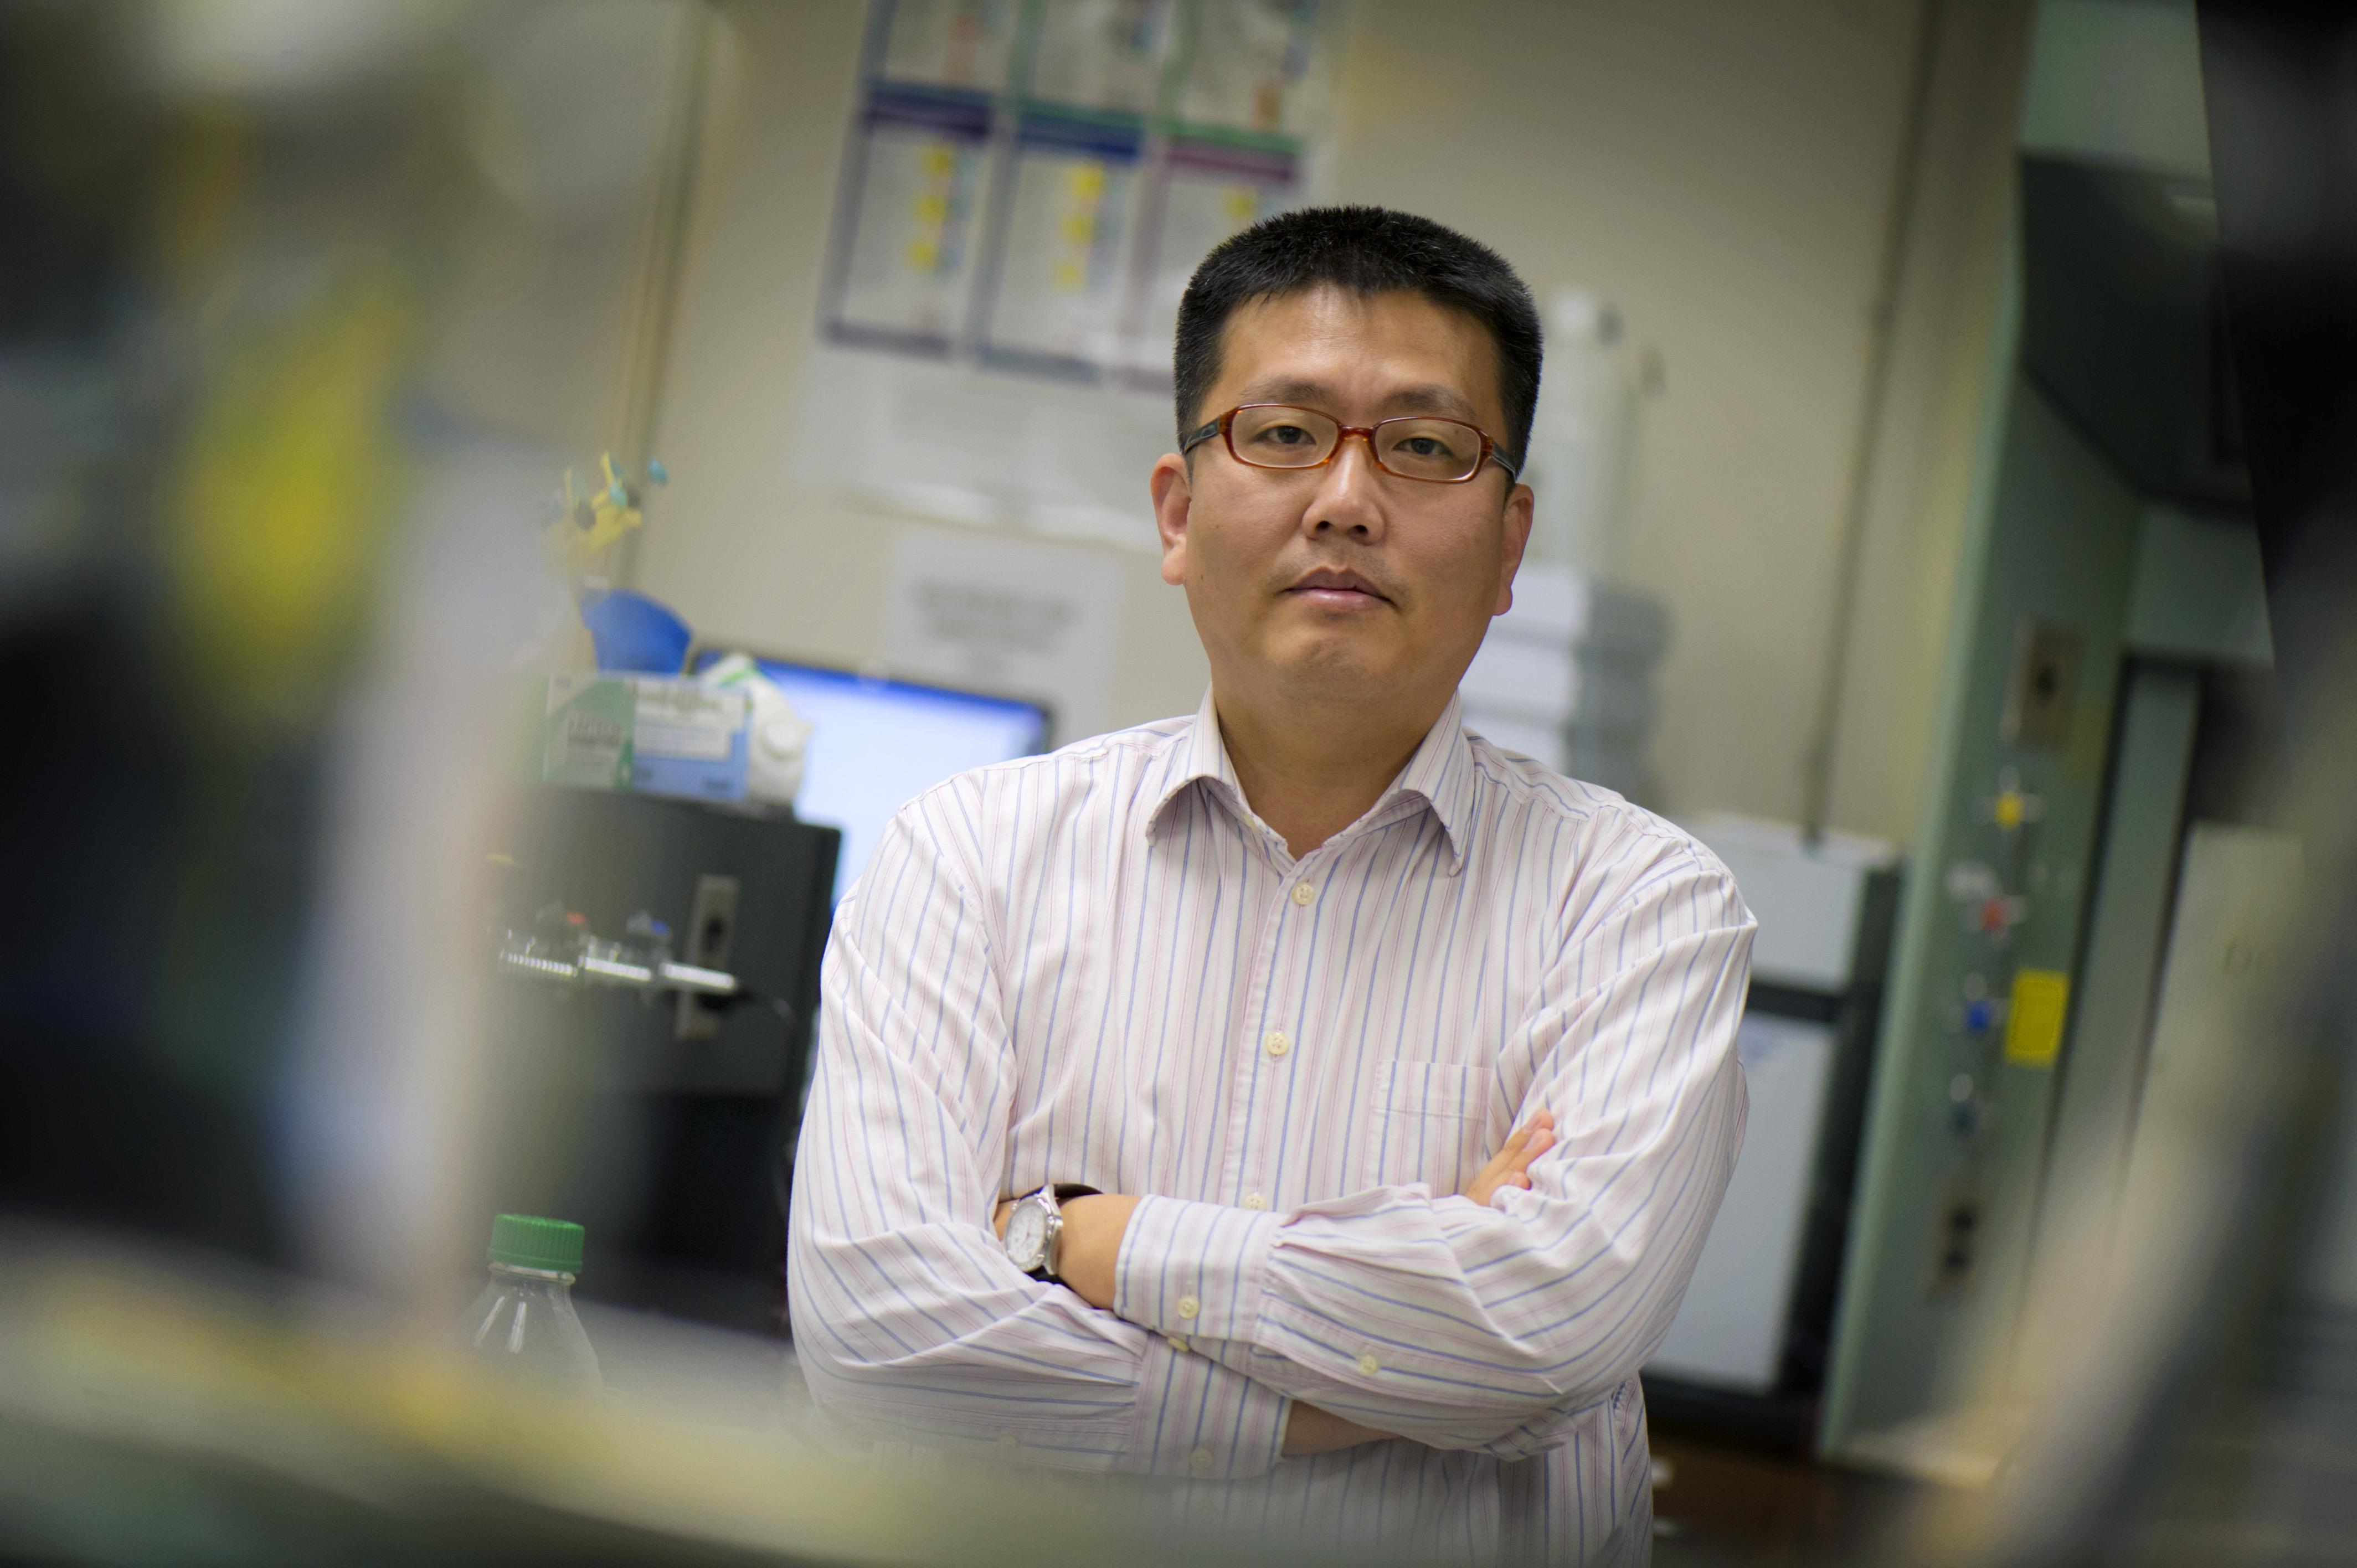 Celyna Rackov Summer 2020.Dr Hyeok Choi Explore University Of Texas At Arlington